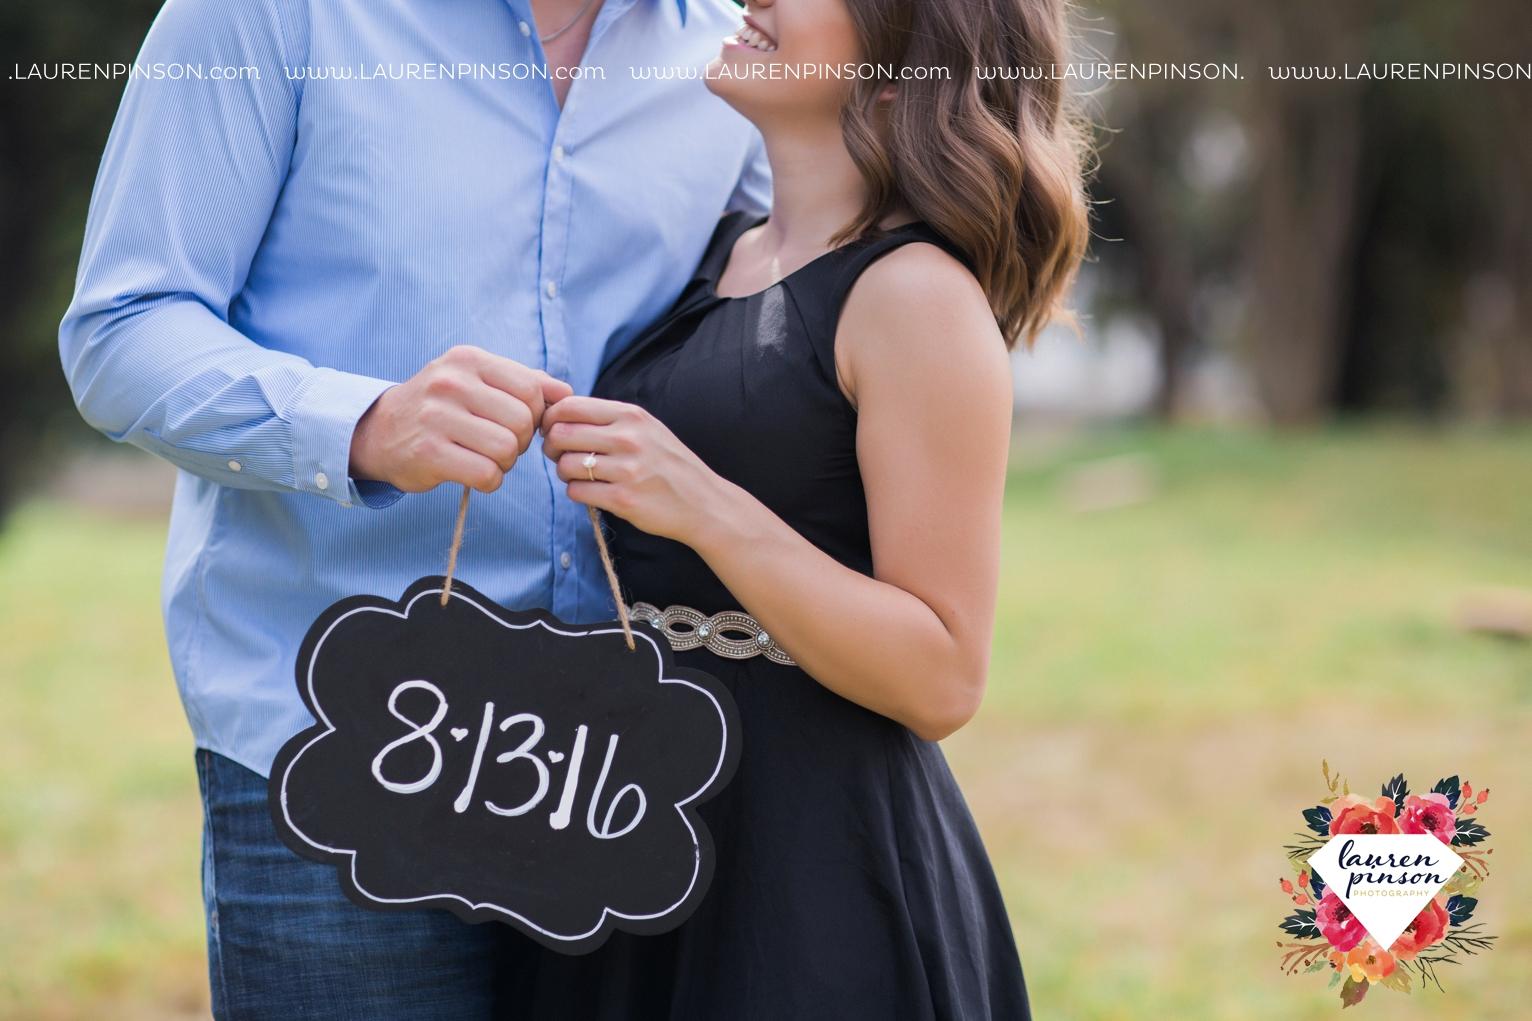 austin-texas-engagement-session-photography-by-wichita-falls-wedding-photgraphy-lauren-pinson_1400.jpg